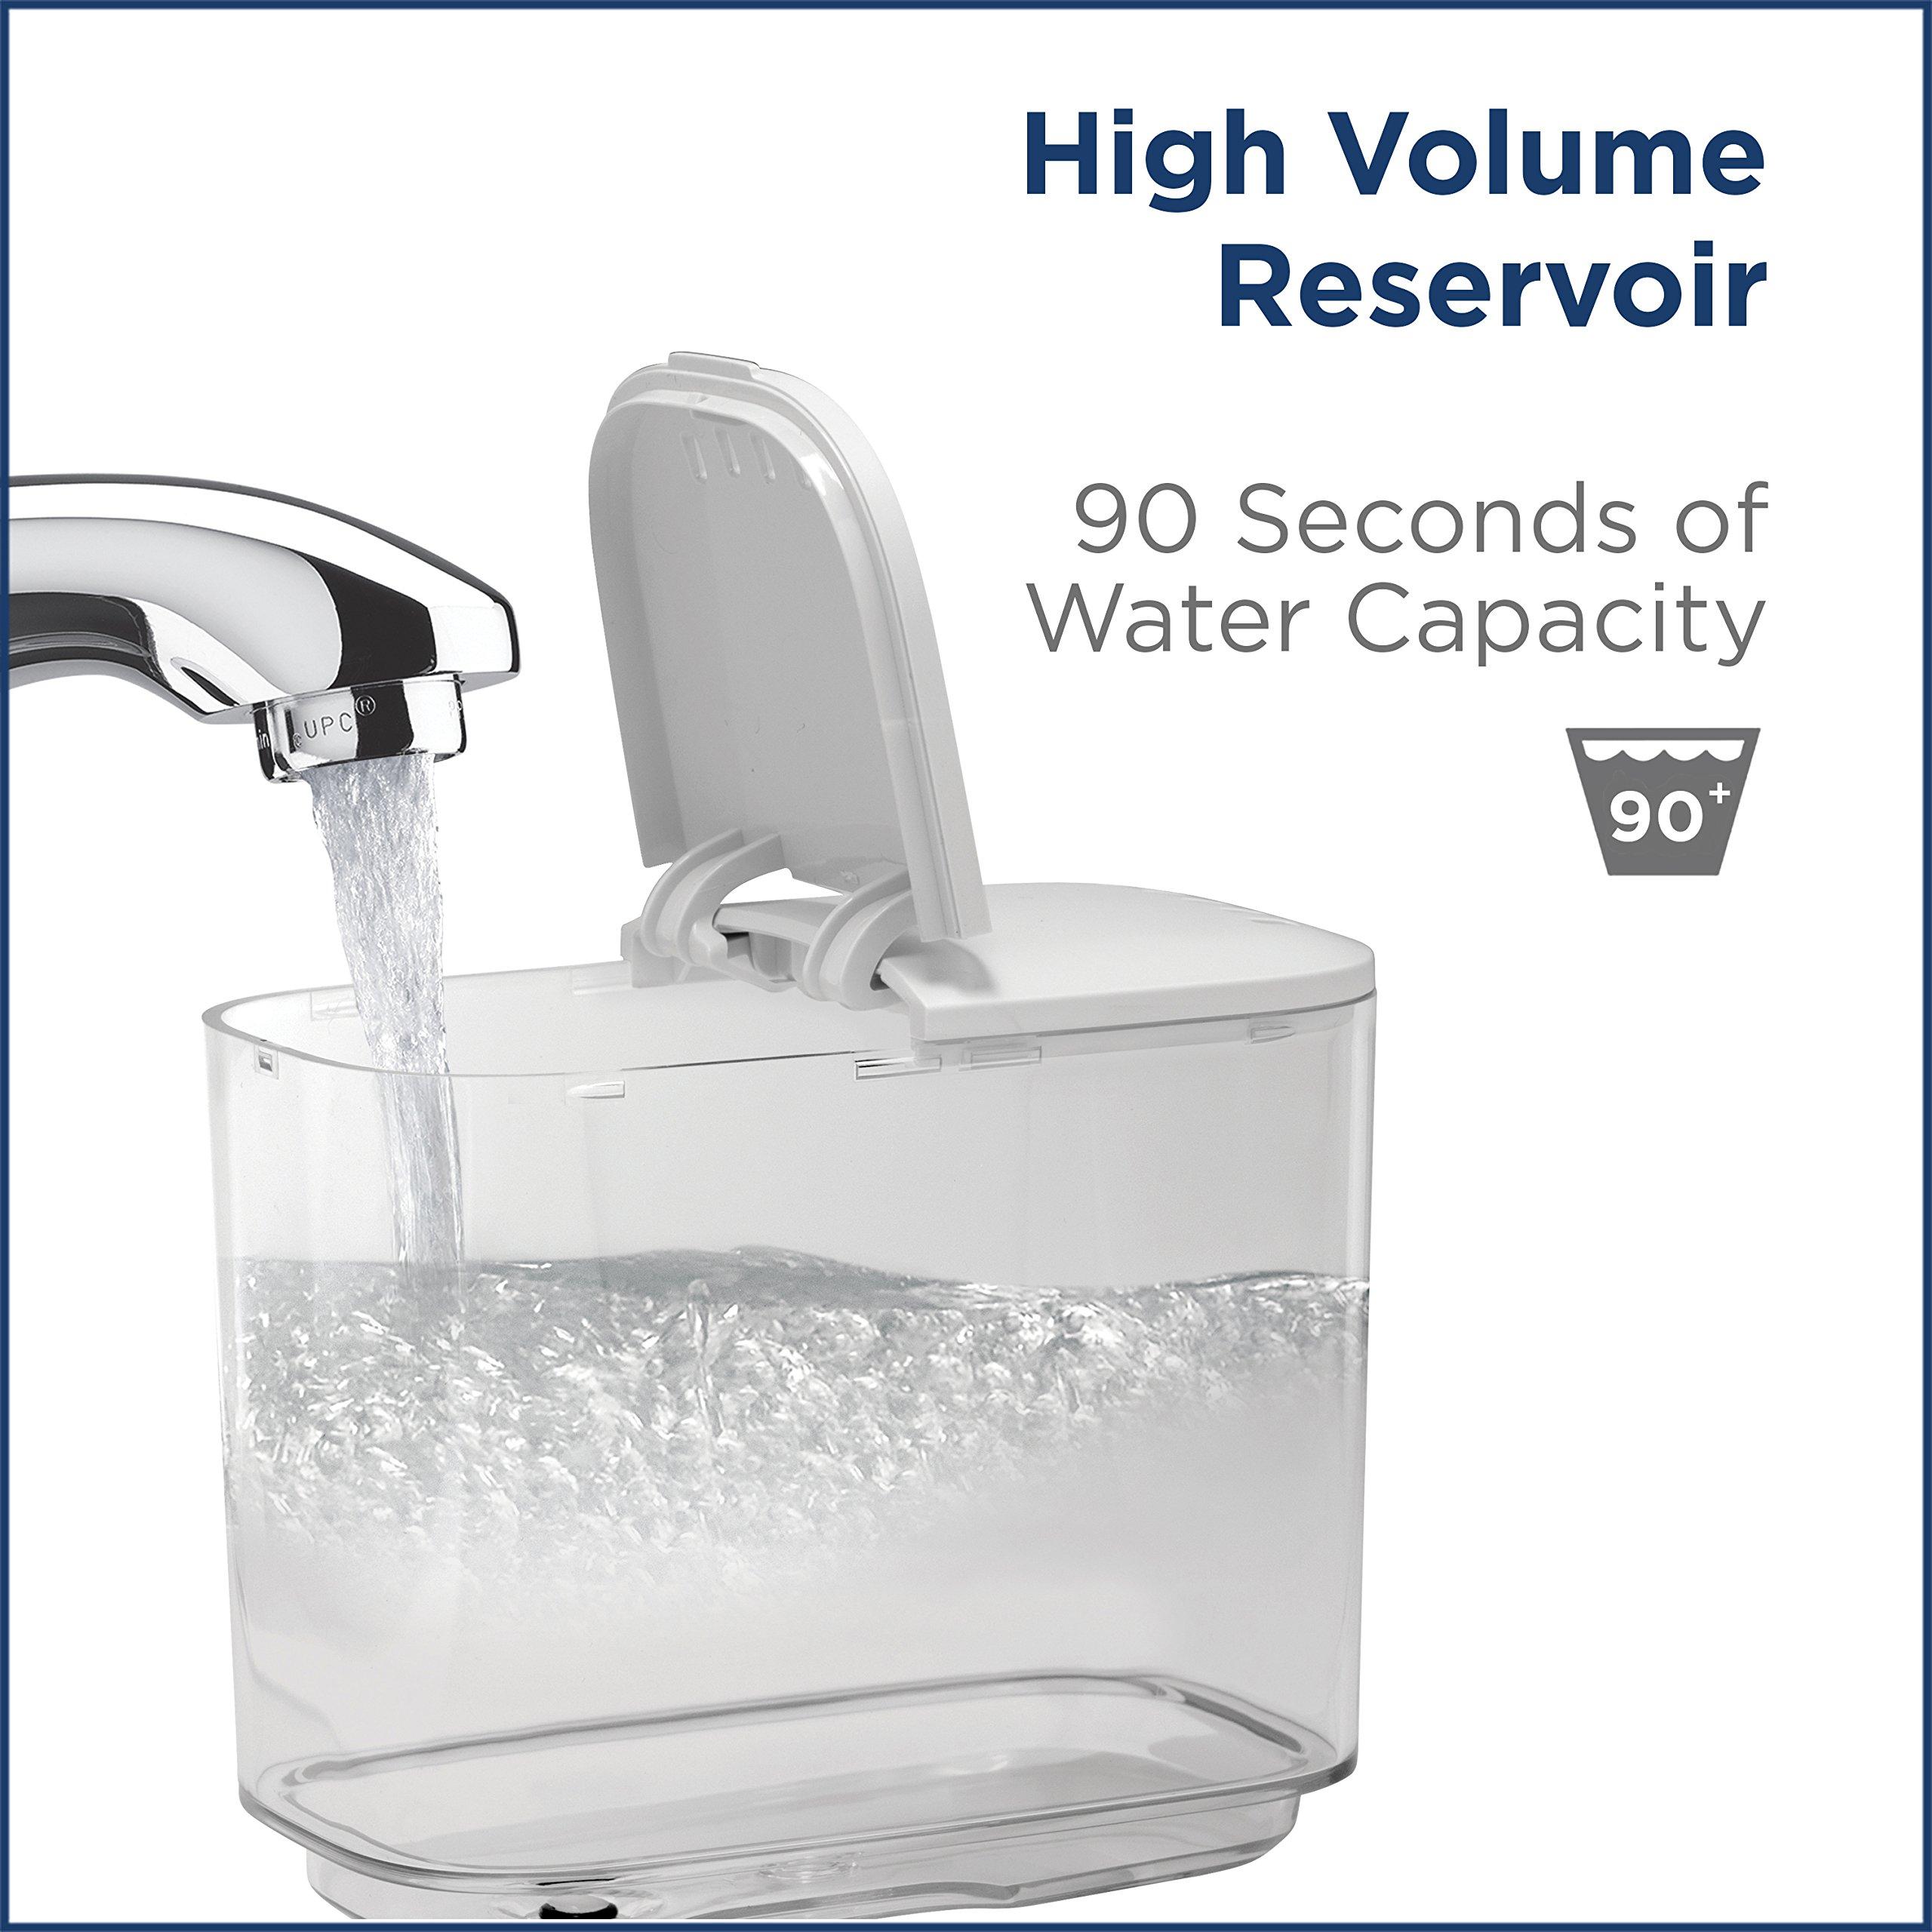 Waterpik Complete Care 9.0 Sonic Electric Toothbrush + Water Flosser, White by Waterpik (Image #10)